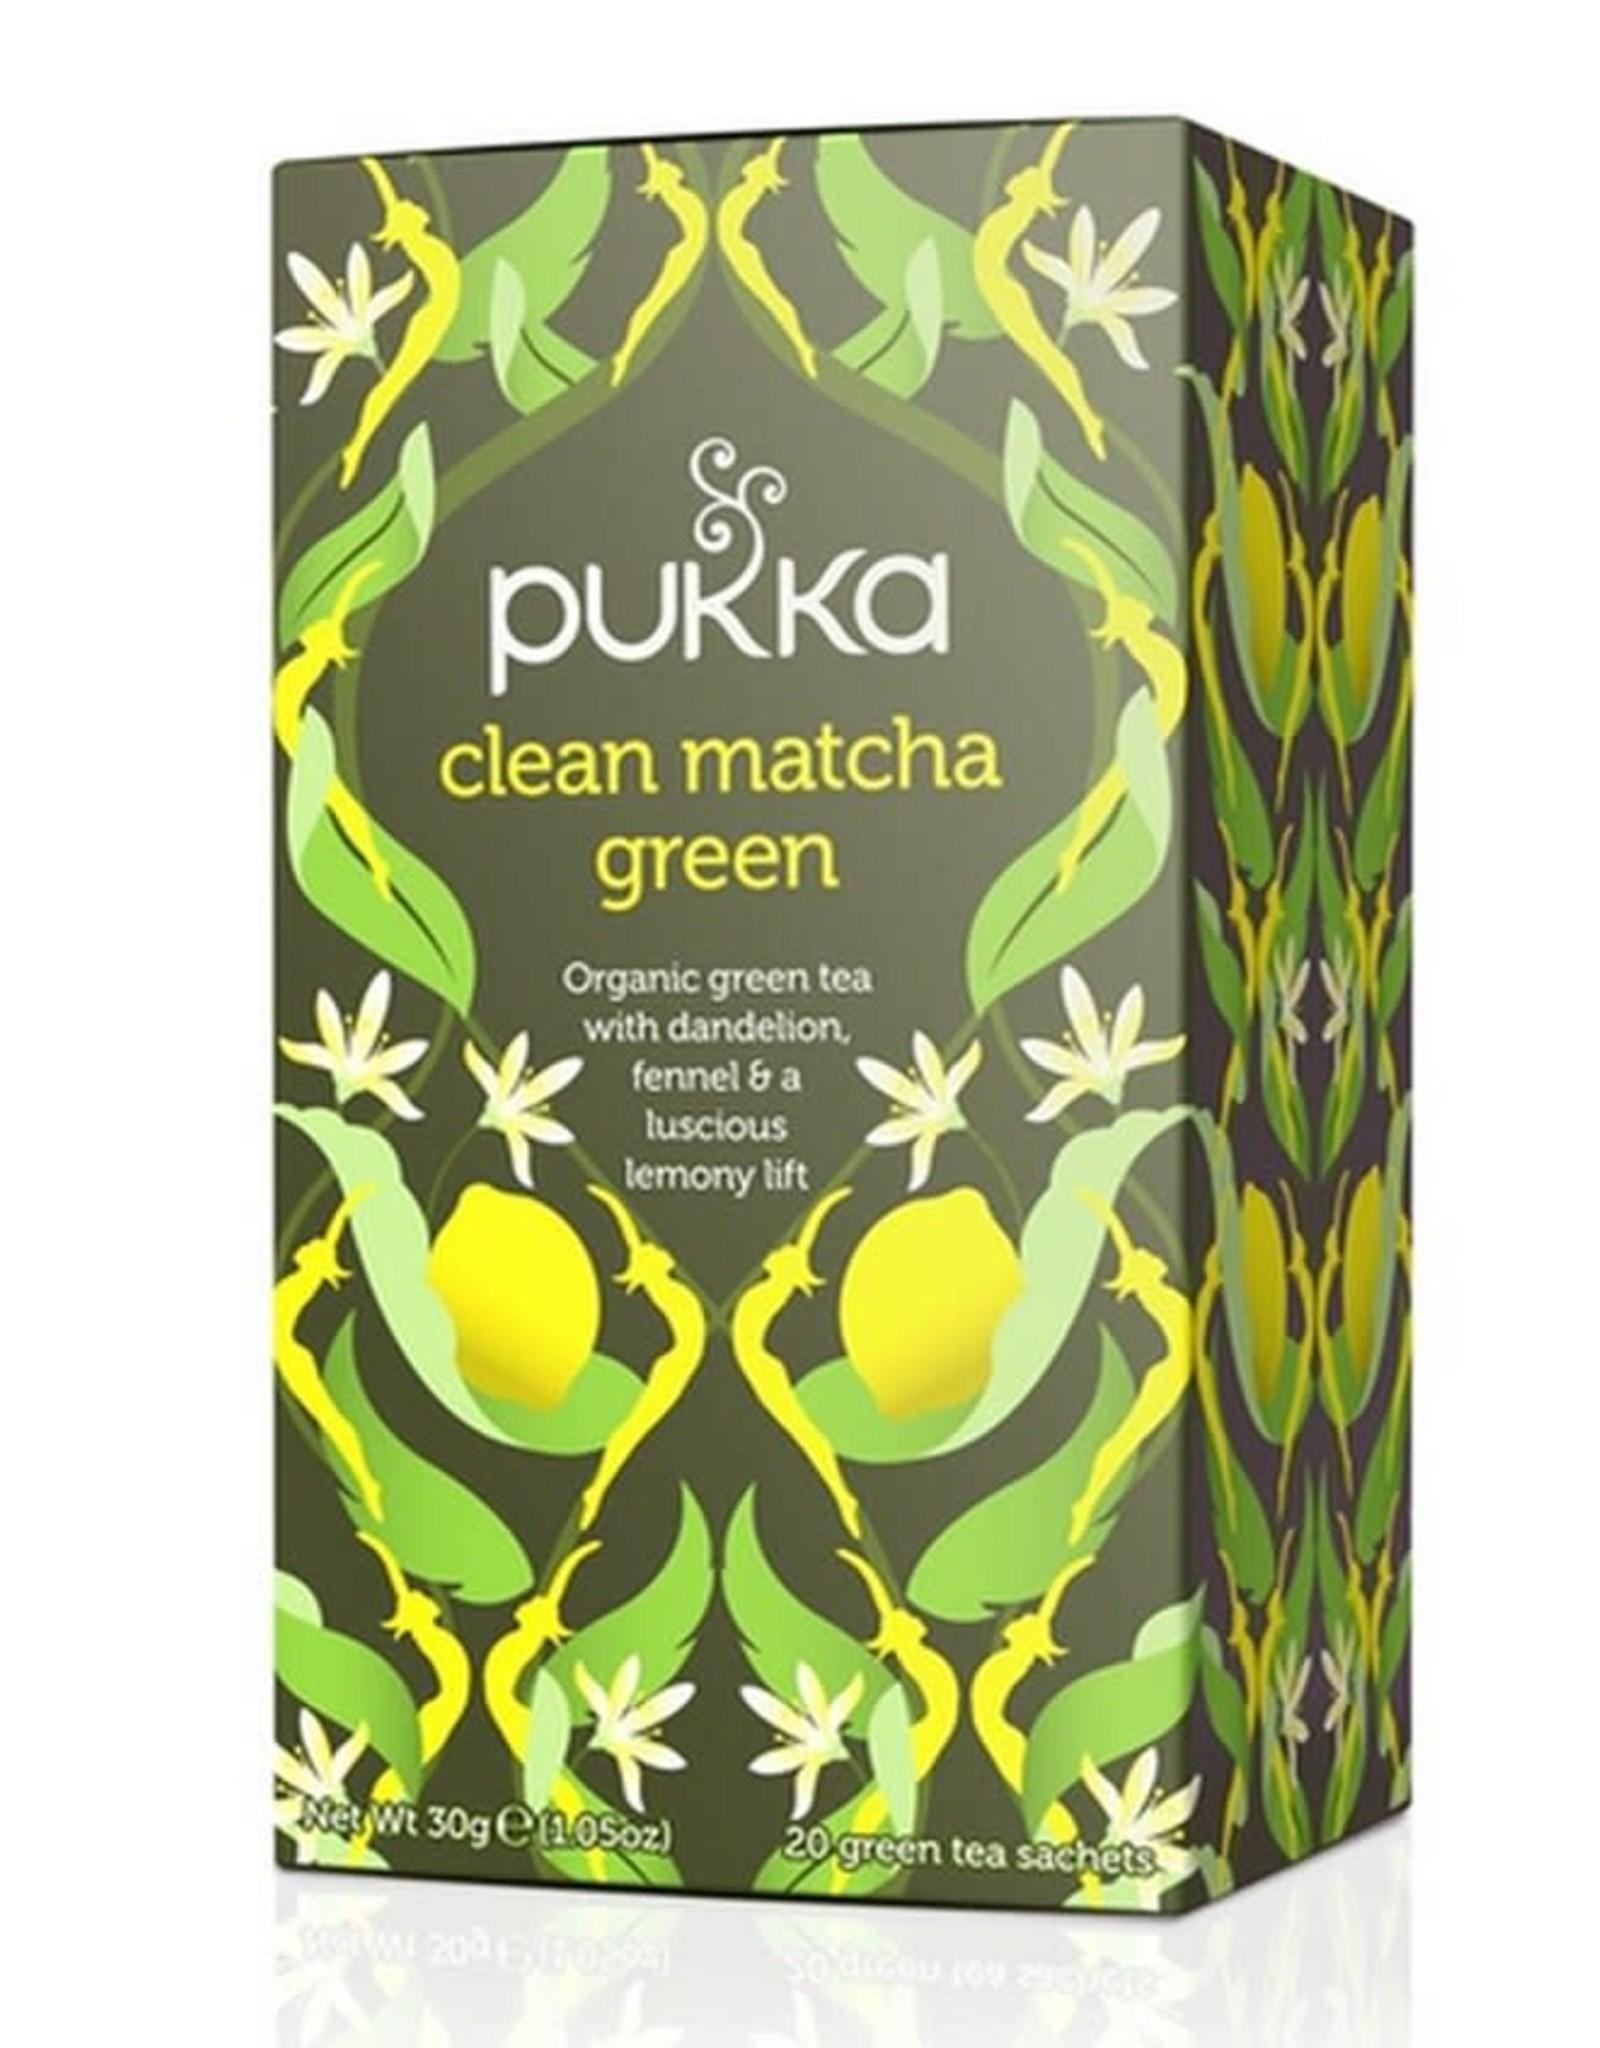 Pukka Clean Matcha Green x 20 Tea Bags